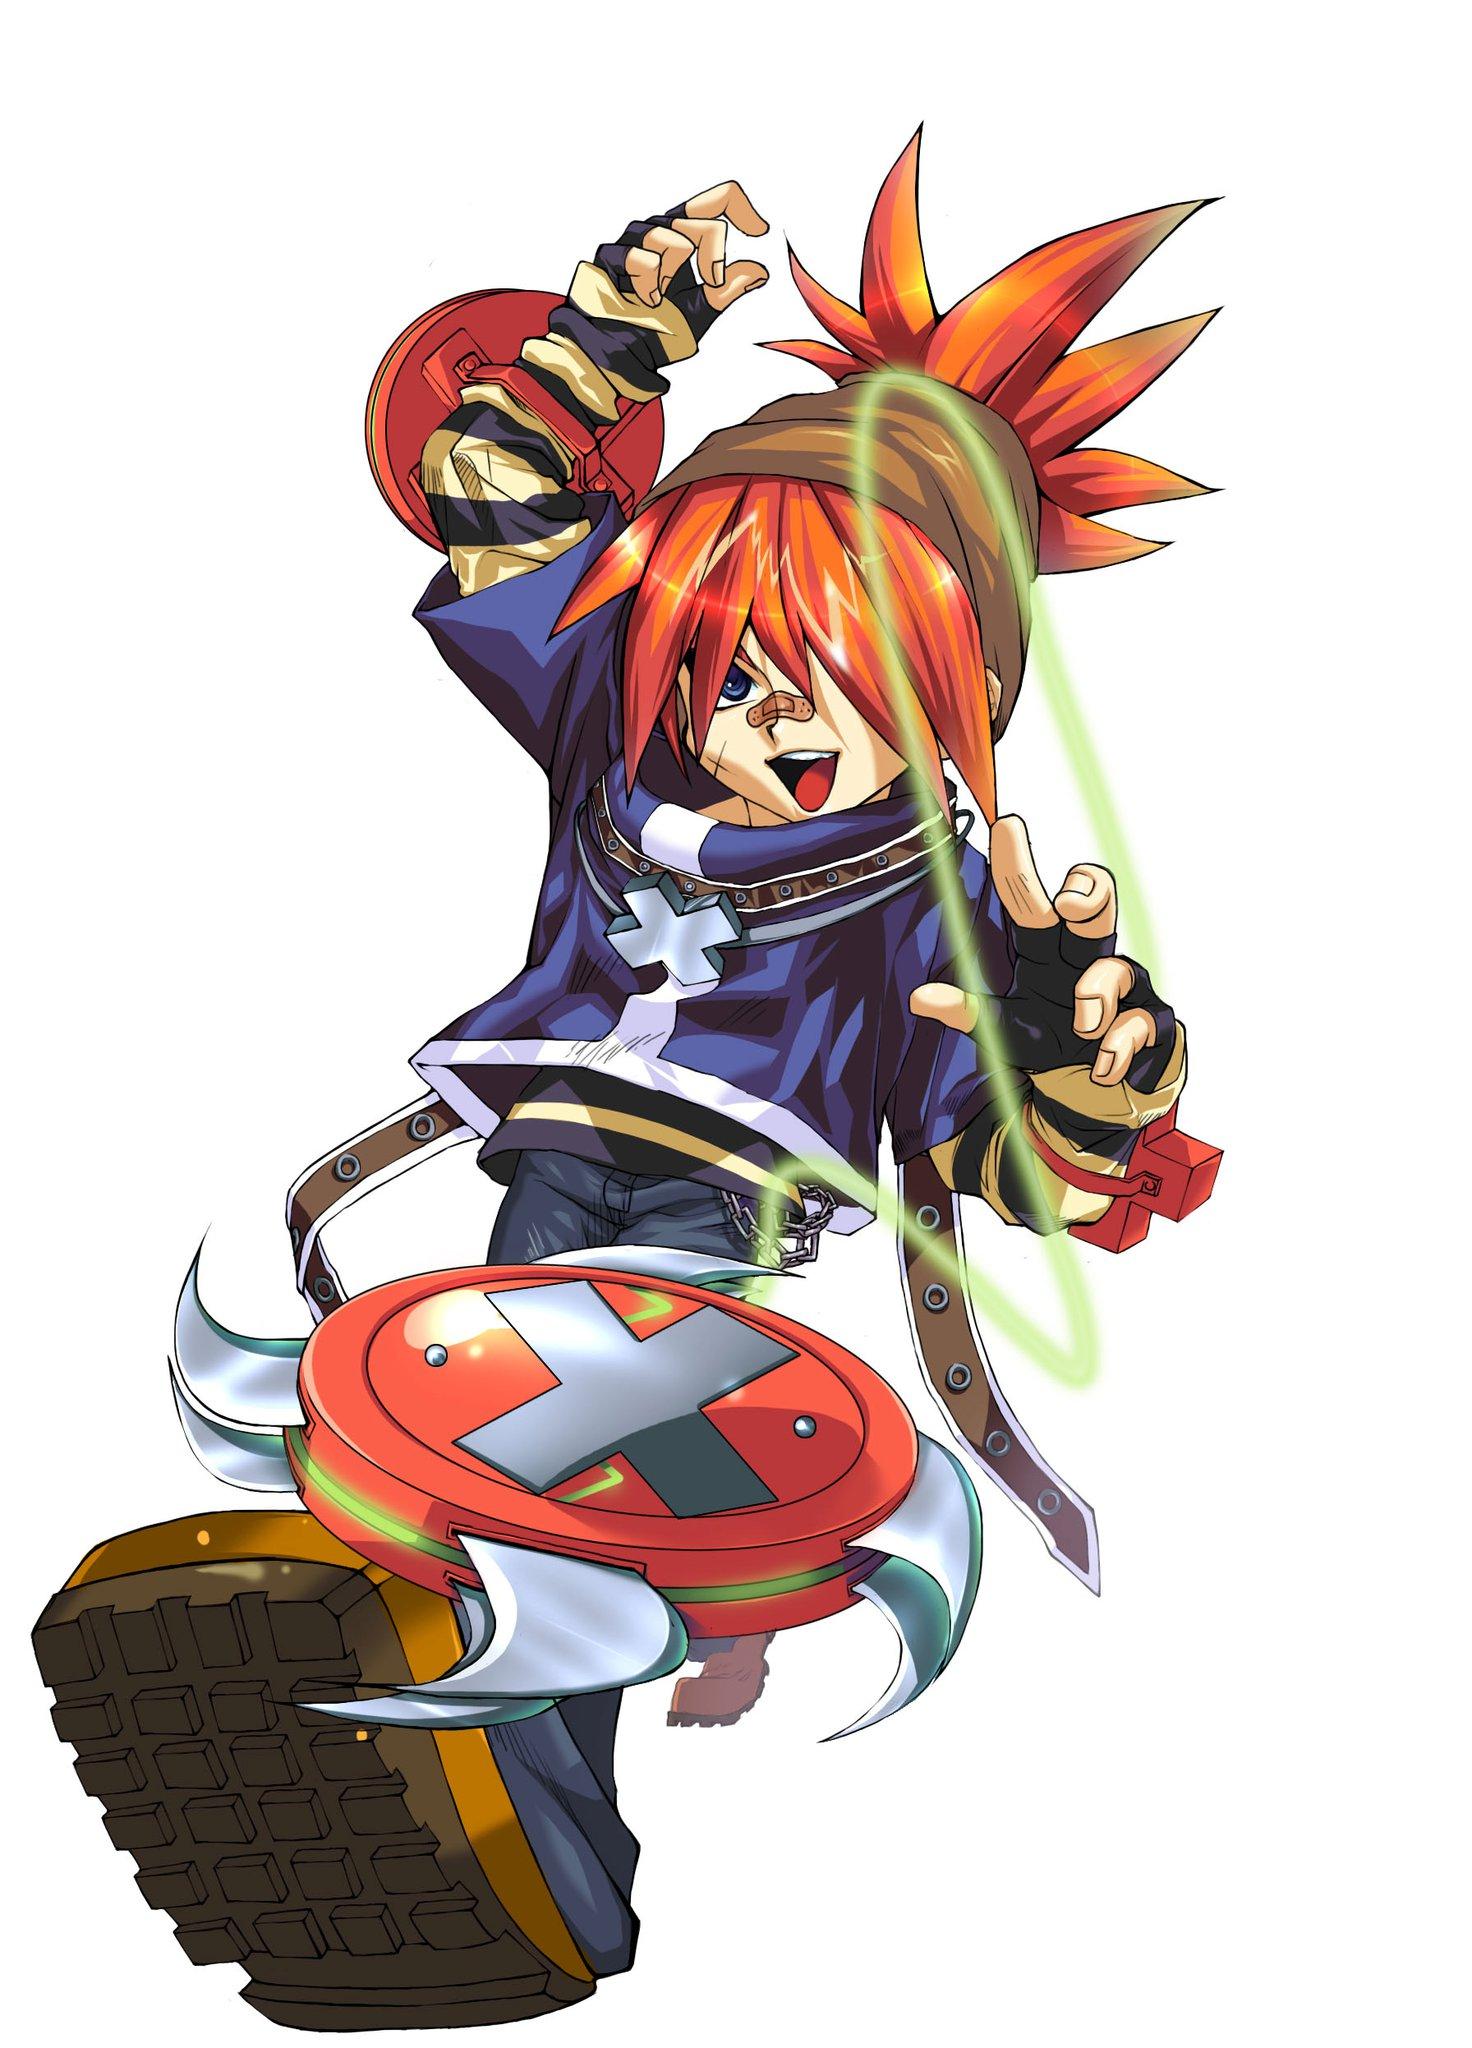 Chris (Mini Fighter)